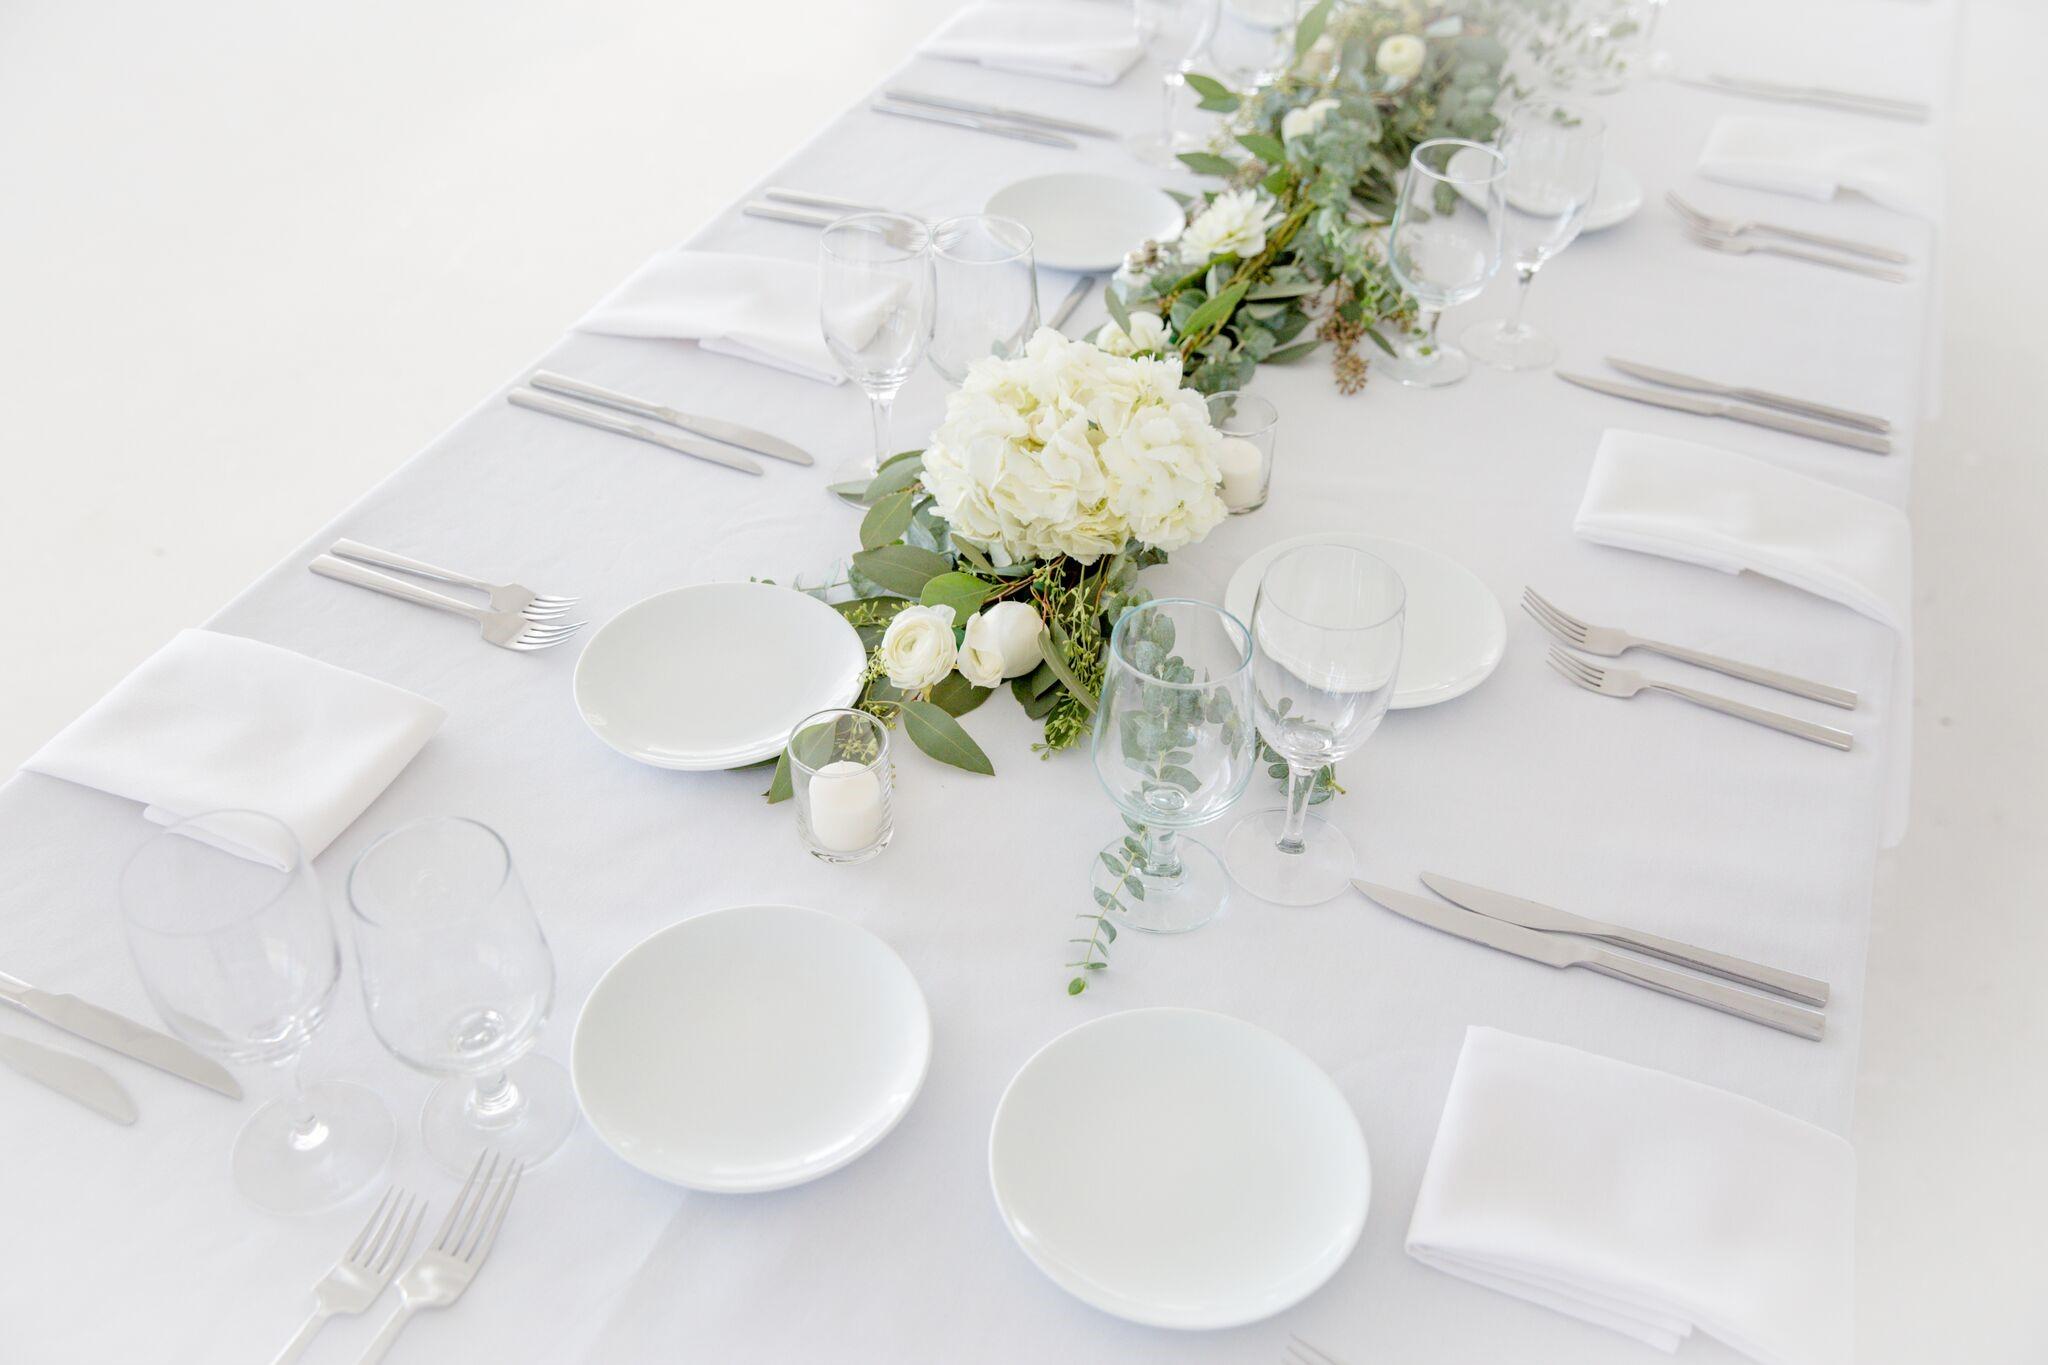 Table Far.jpg